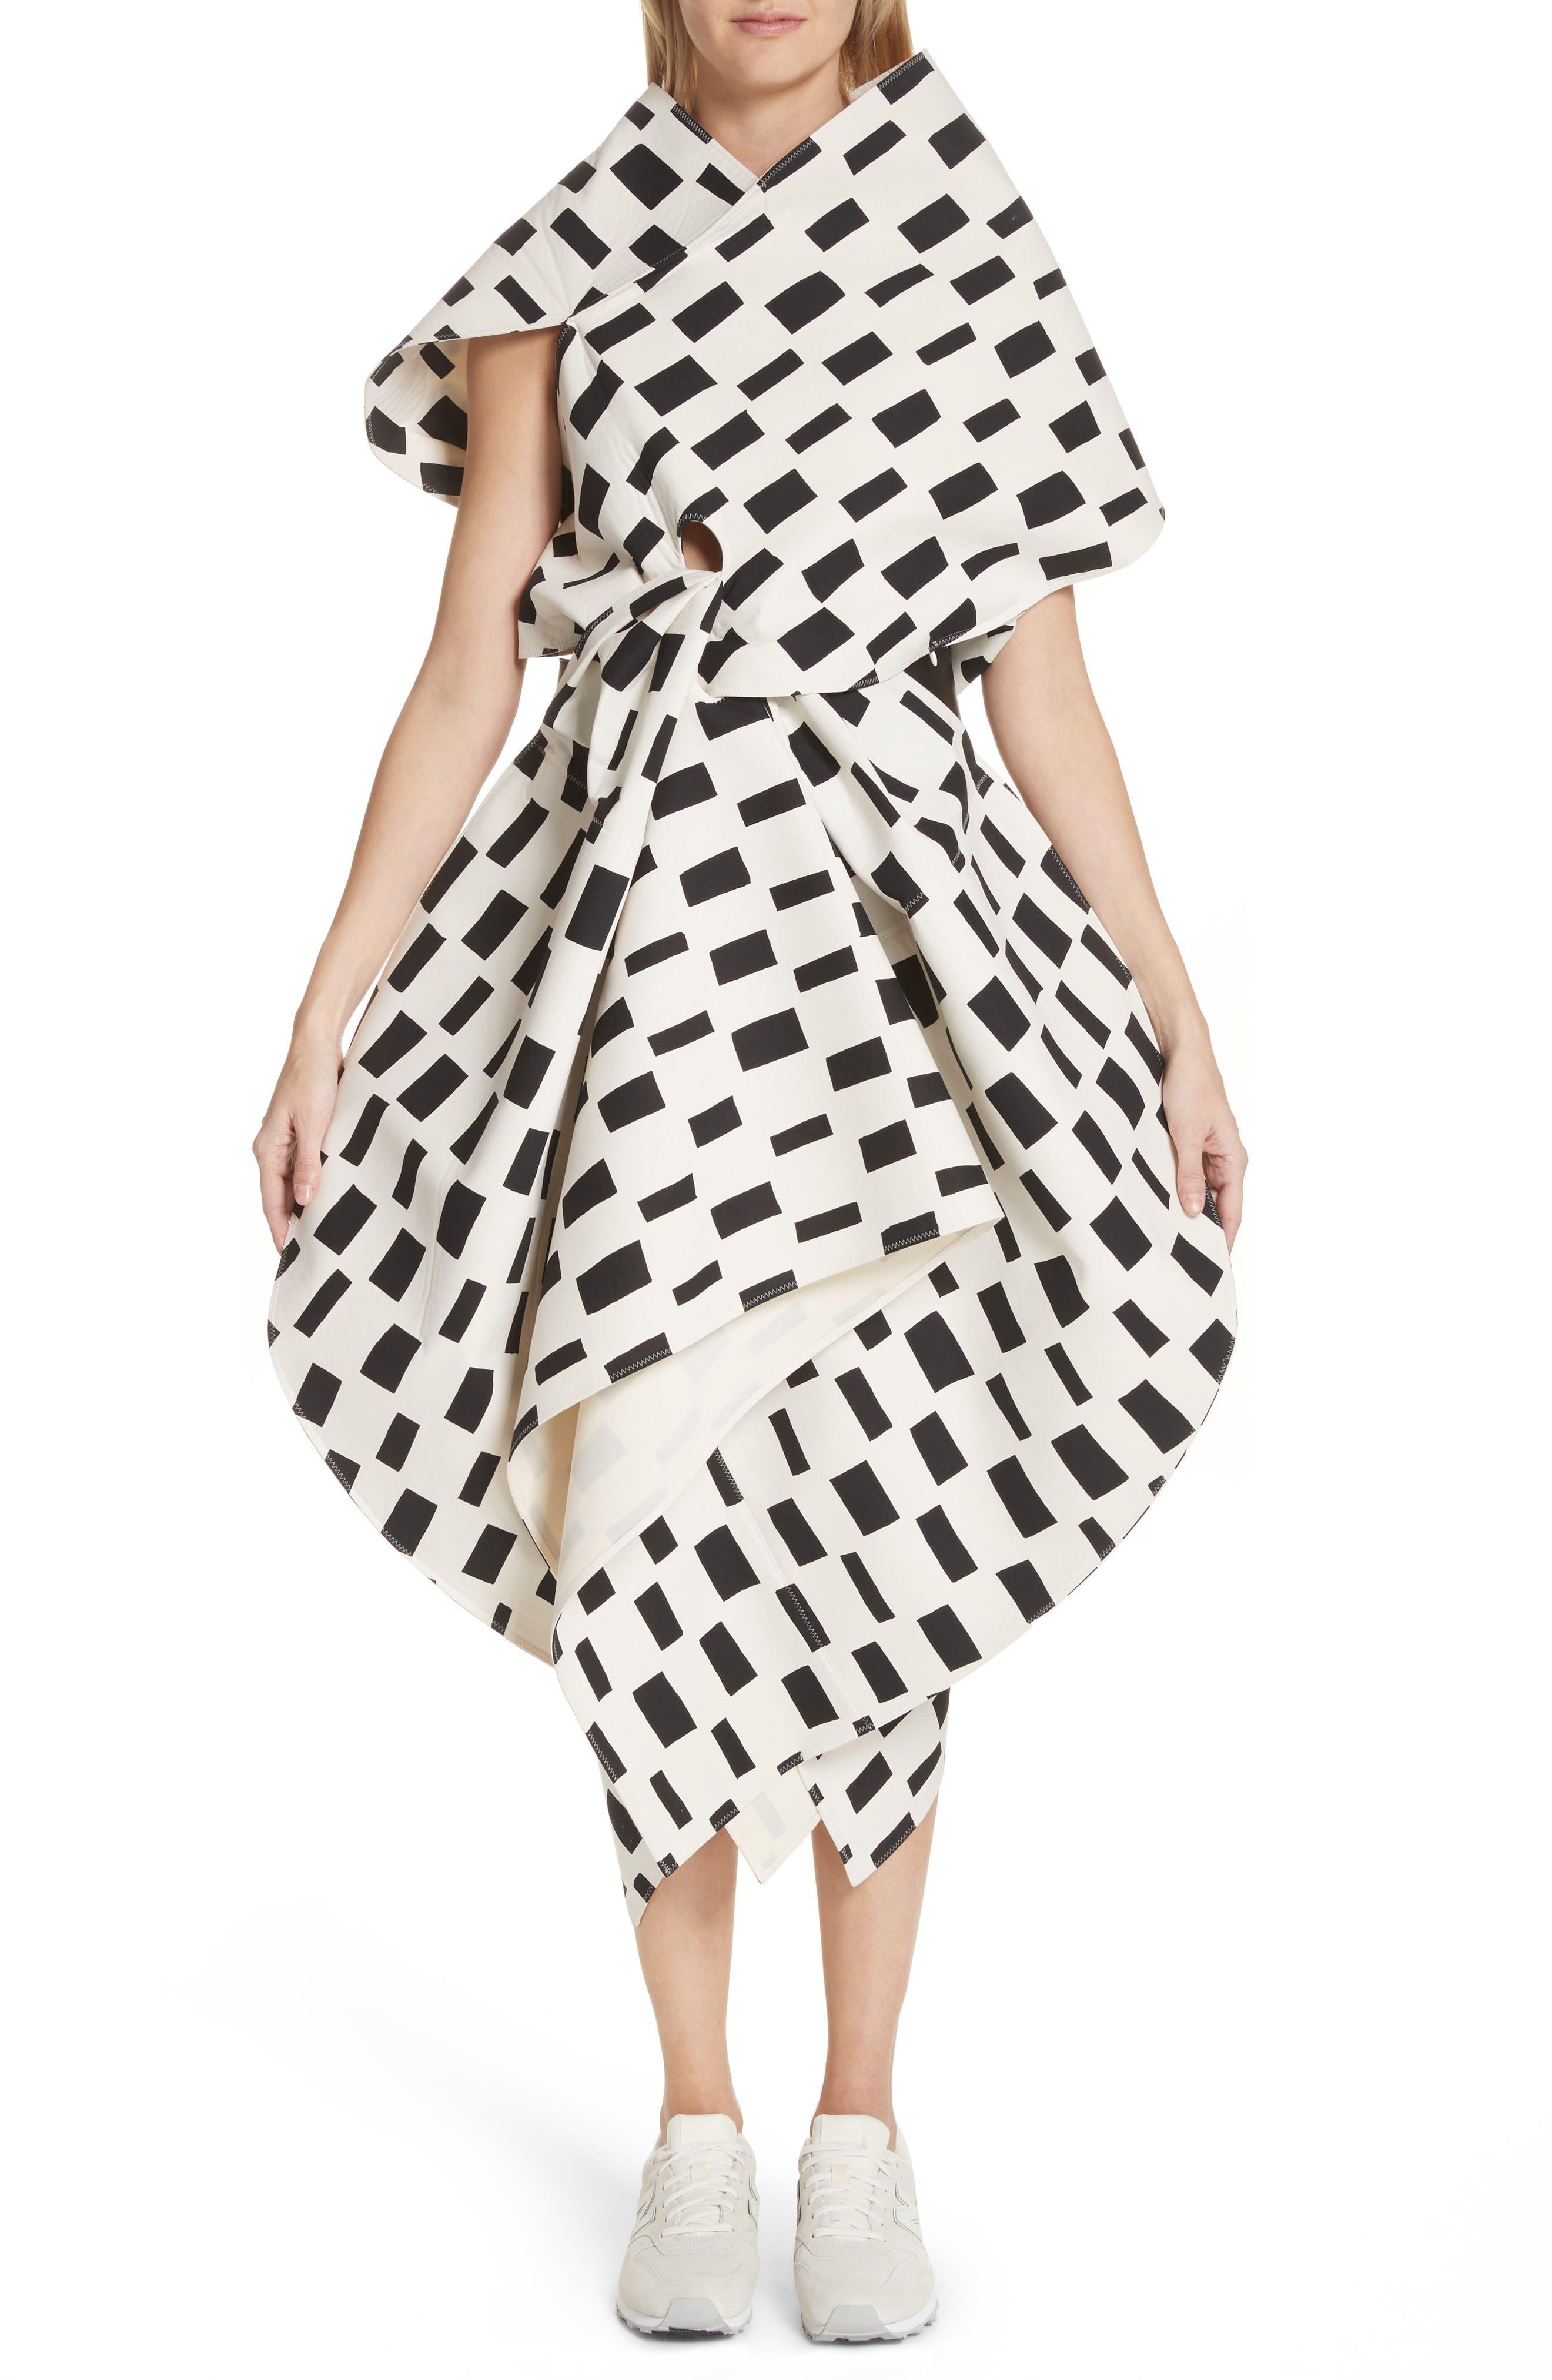 Interweave Geo Print Dress,                         Main,                         color, Off White/ Black